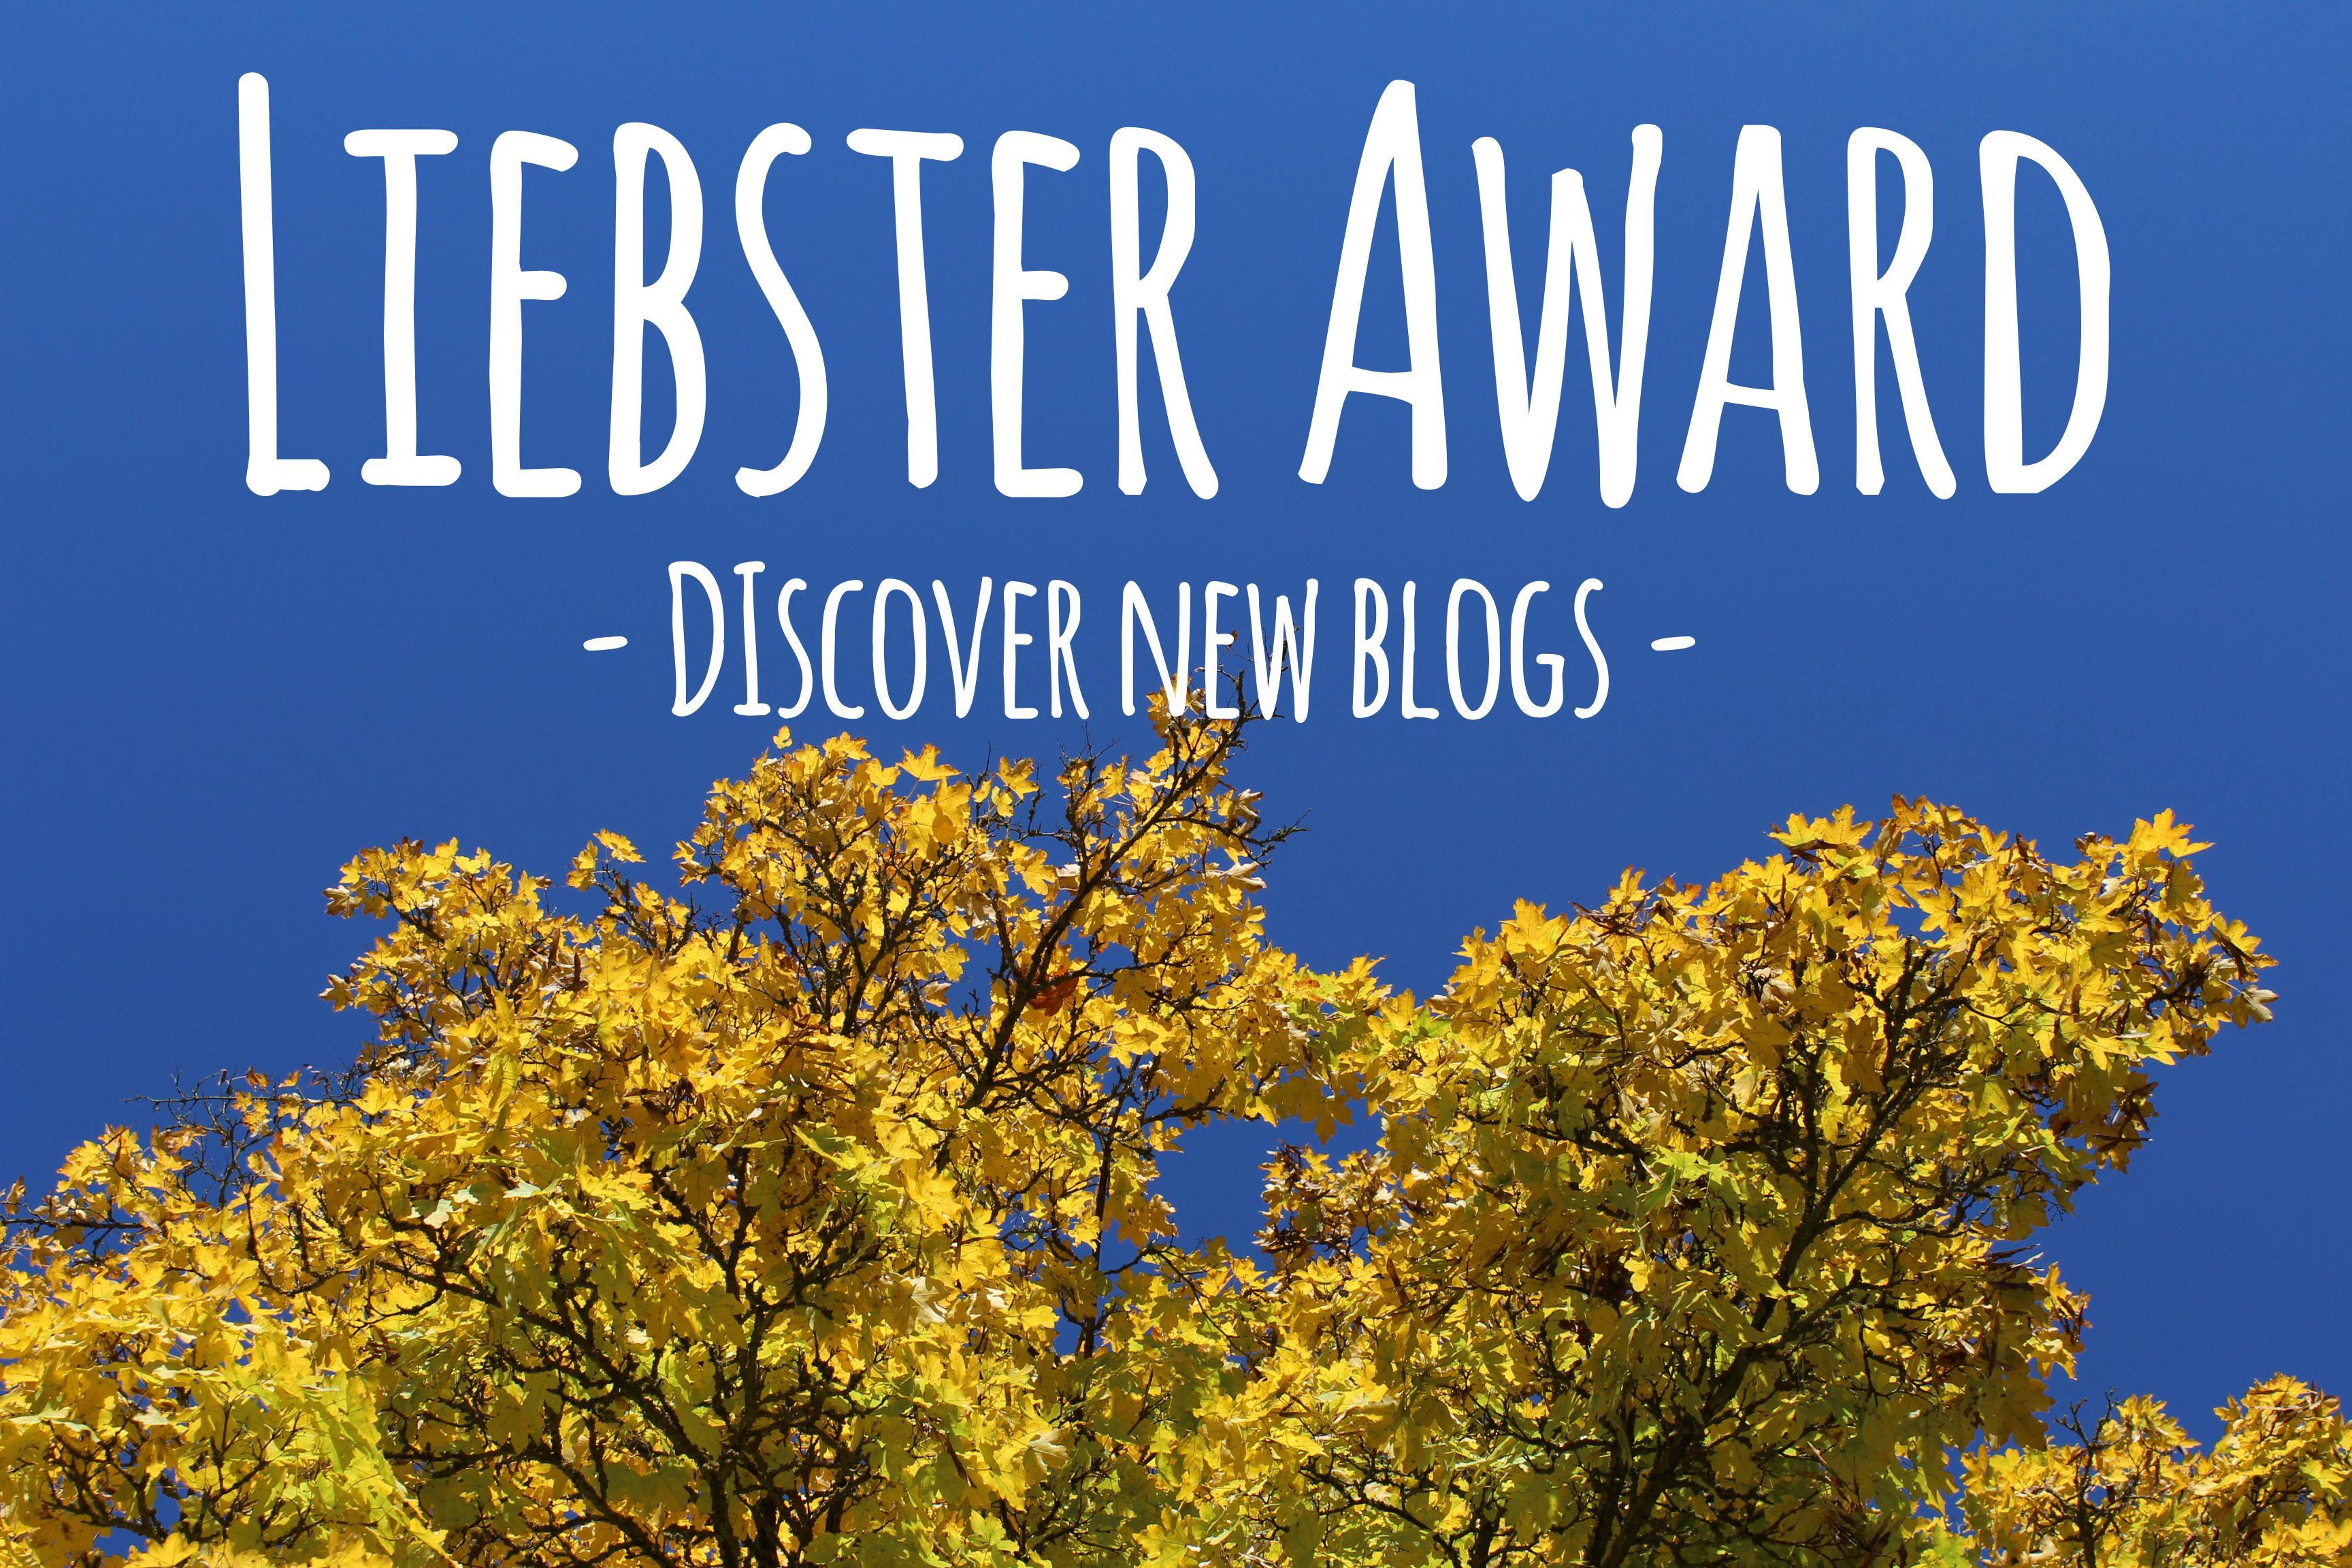 Liebsteraward Logo - 26102015_72dpi